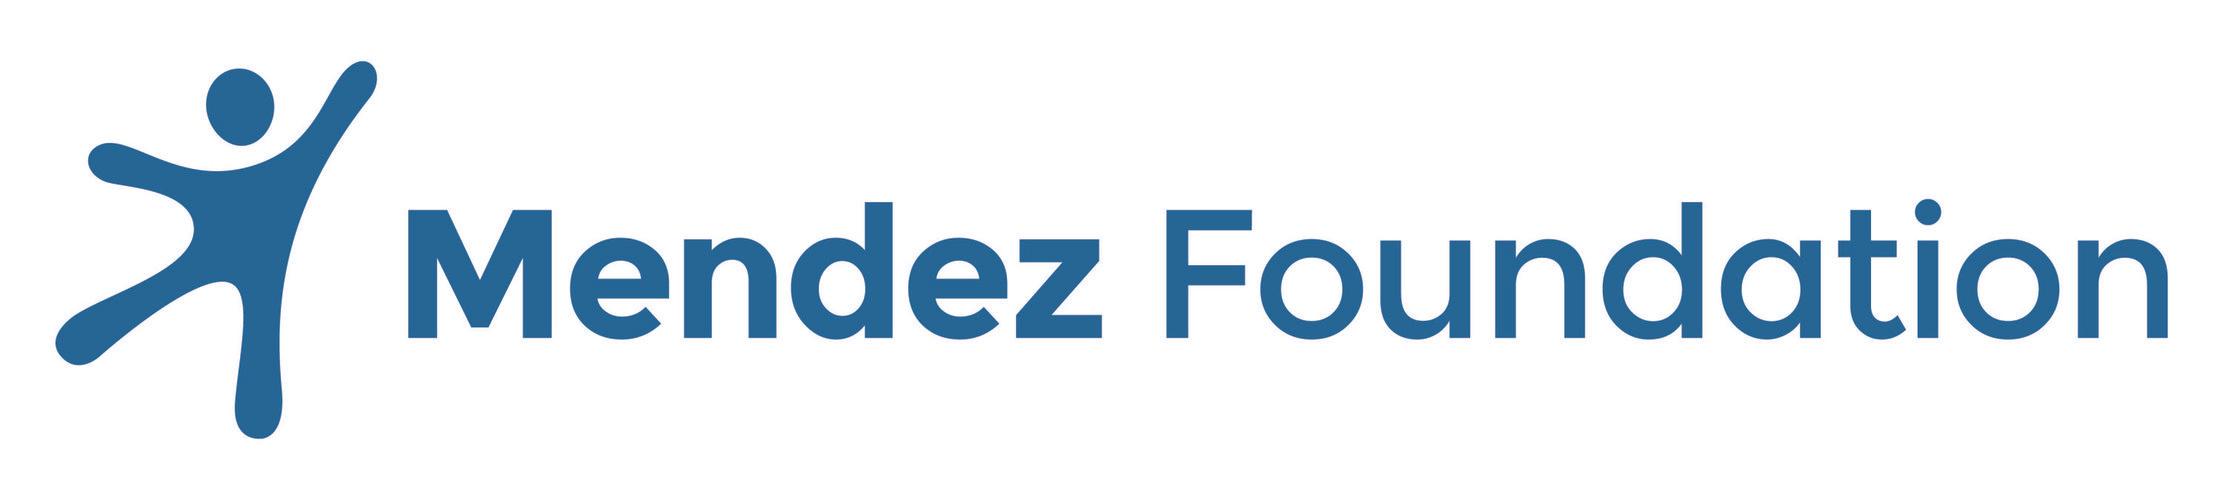 Exhibitor - Mendez Foundation